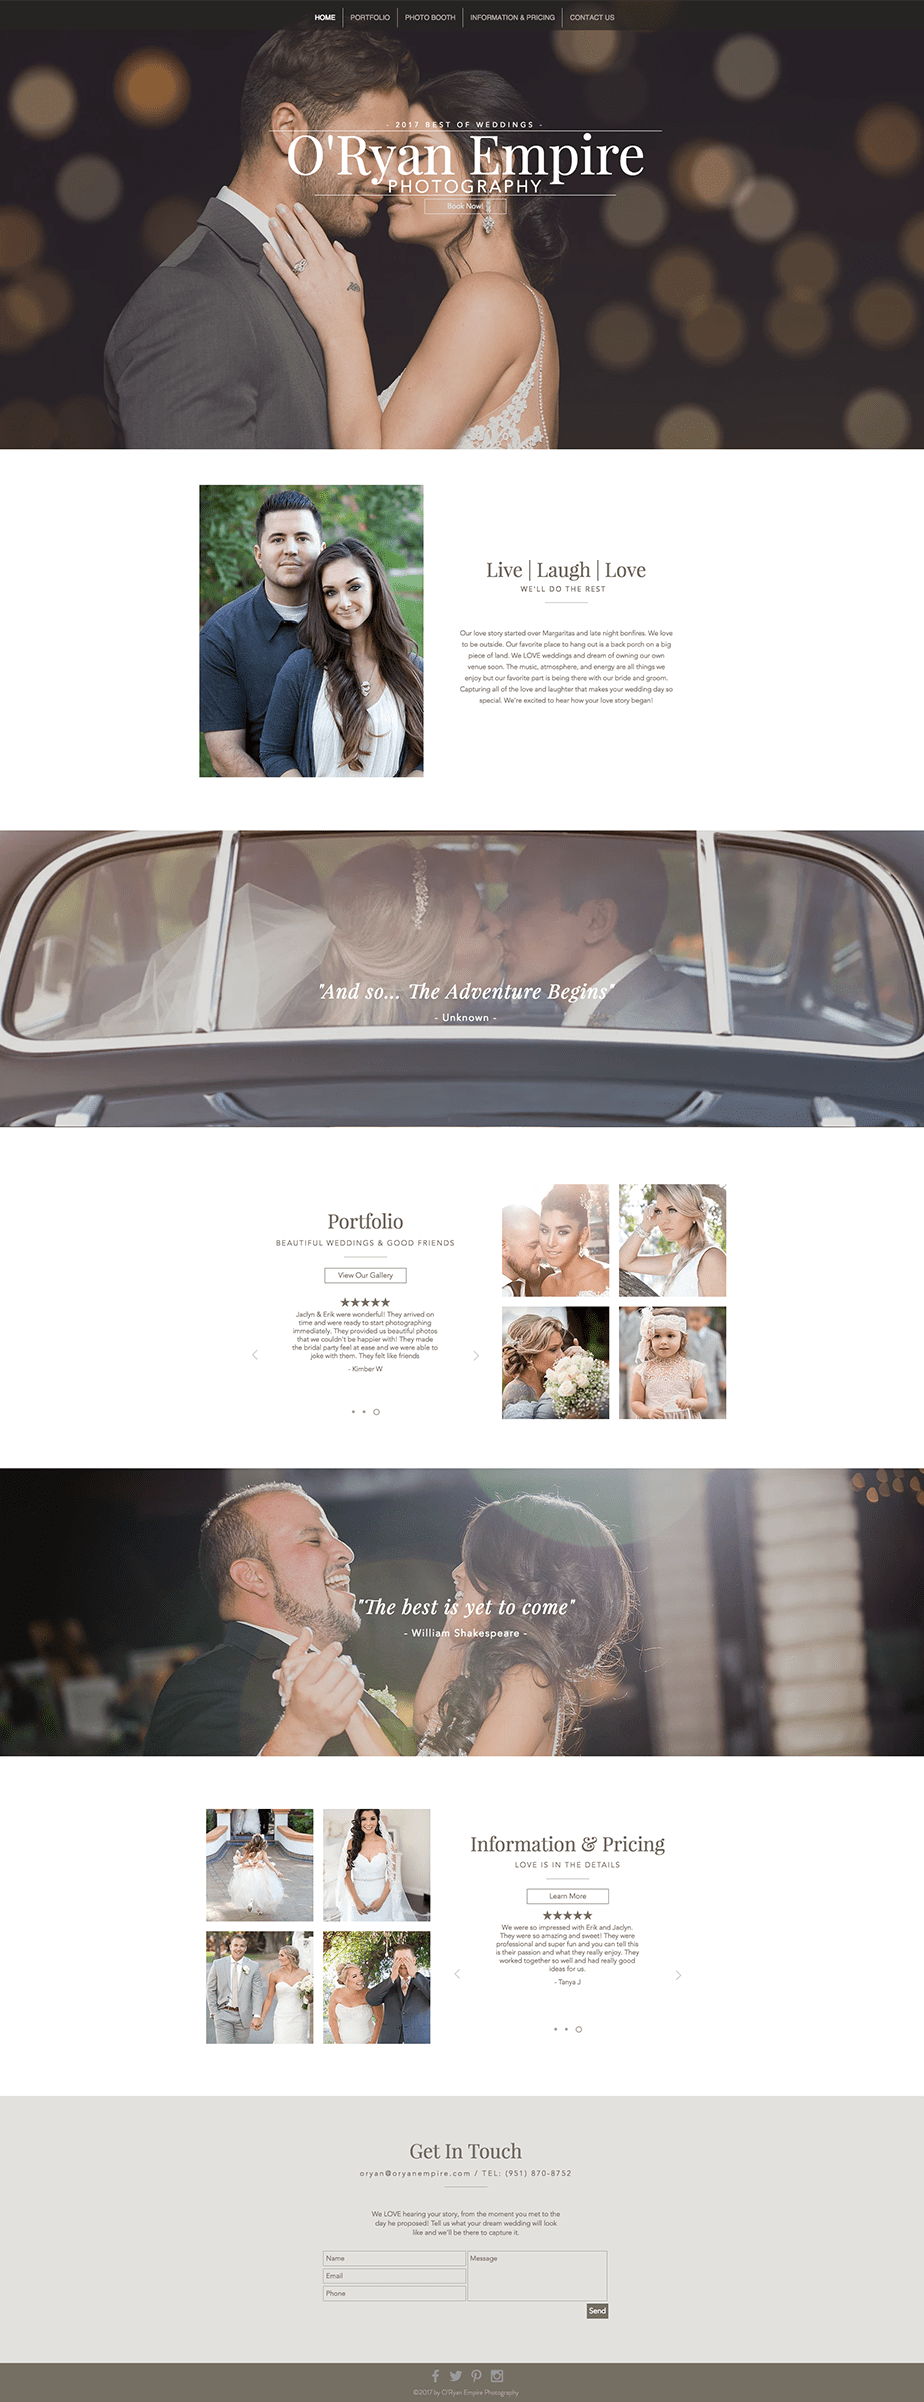 Stunning online portfolio by wedding photographer O'Ryan Empire